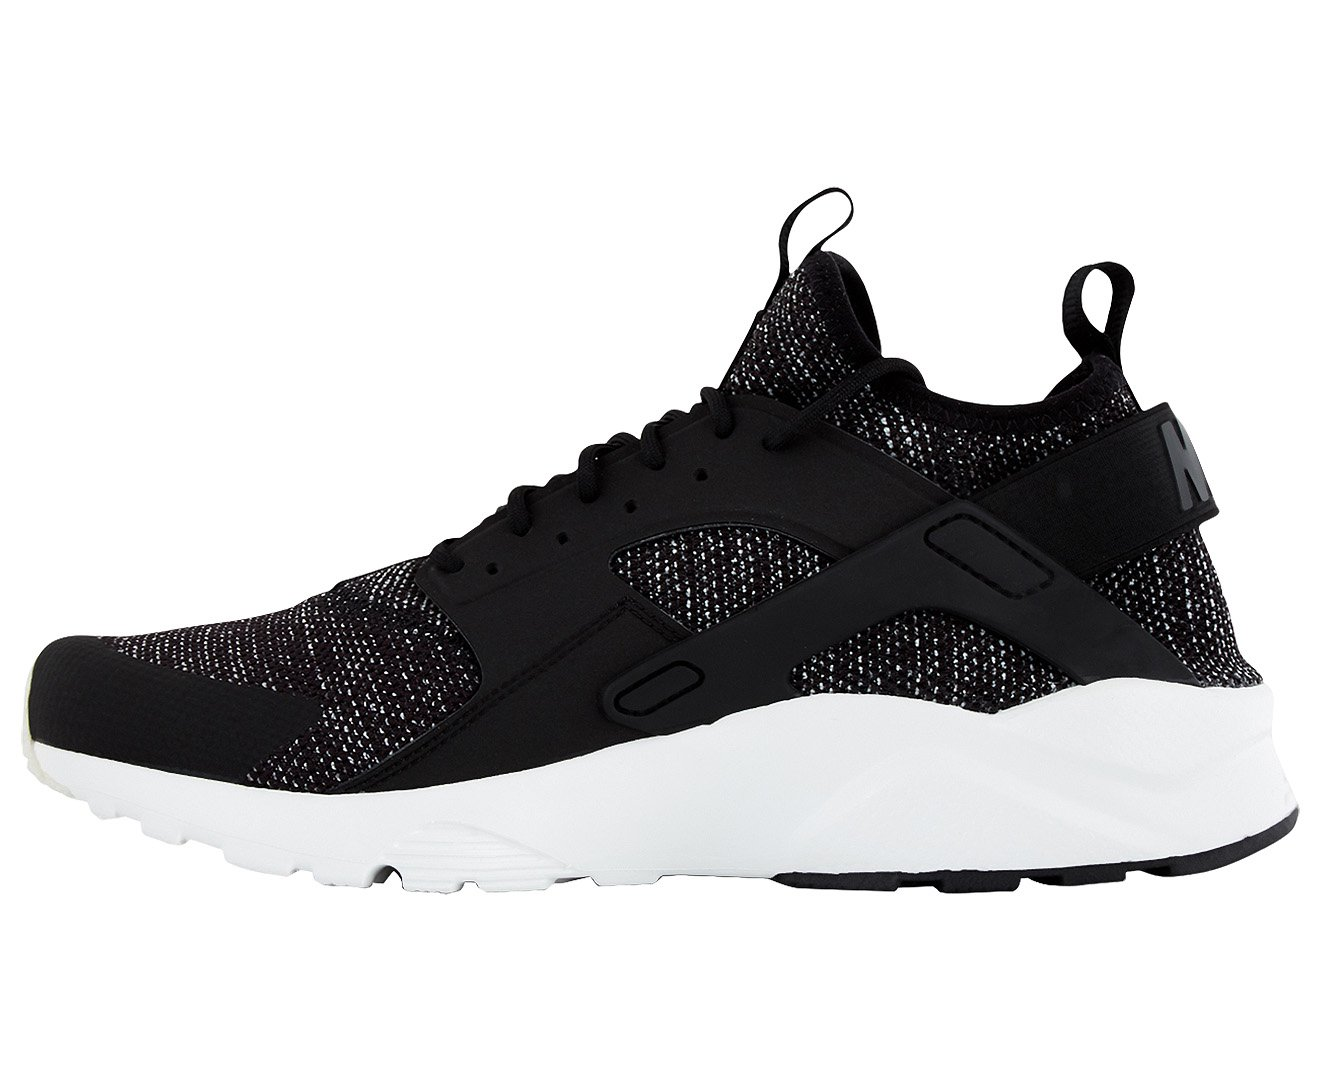 new style 89f8c 01cd5 Nike Mens Men s Nike Air Huarache Ultra, Black Black-Summit White, Size 11.5